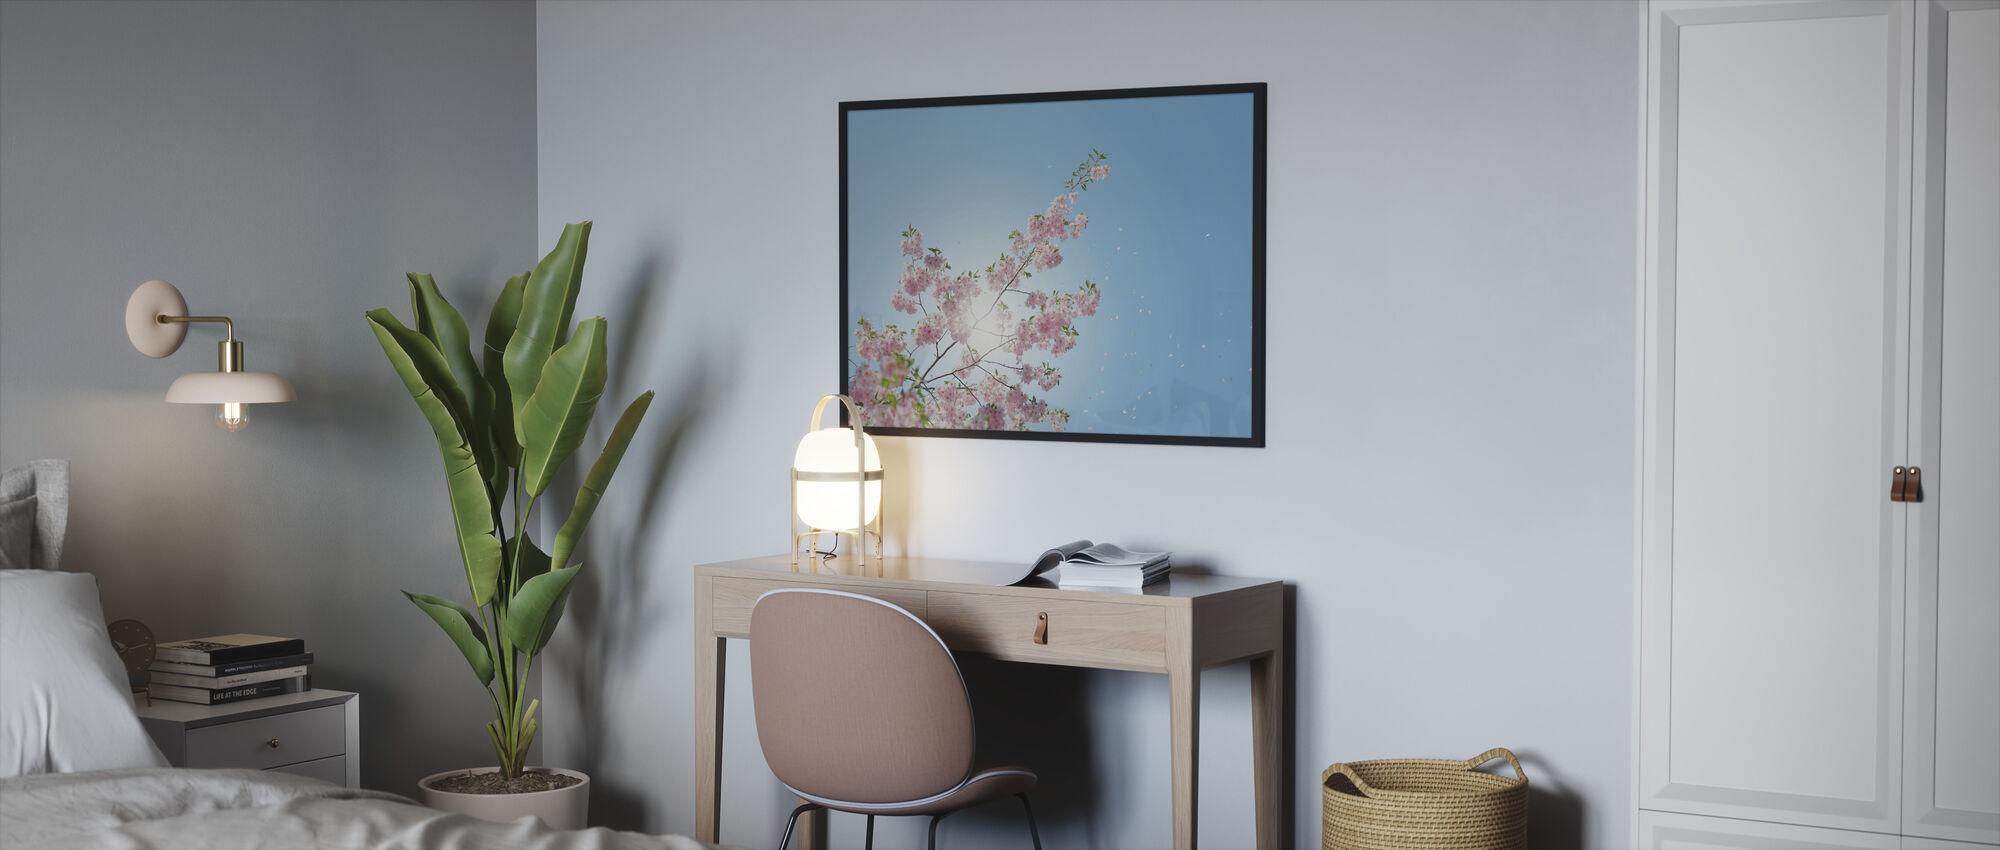 Falling Petals - Framed print - Bedroom